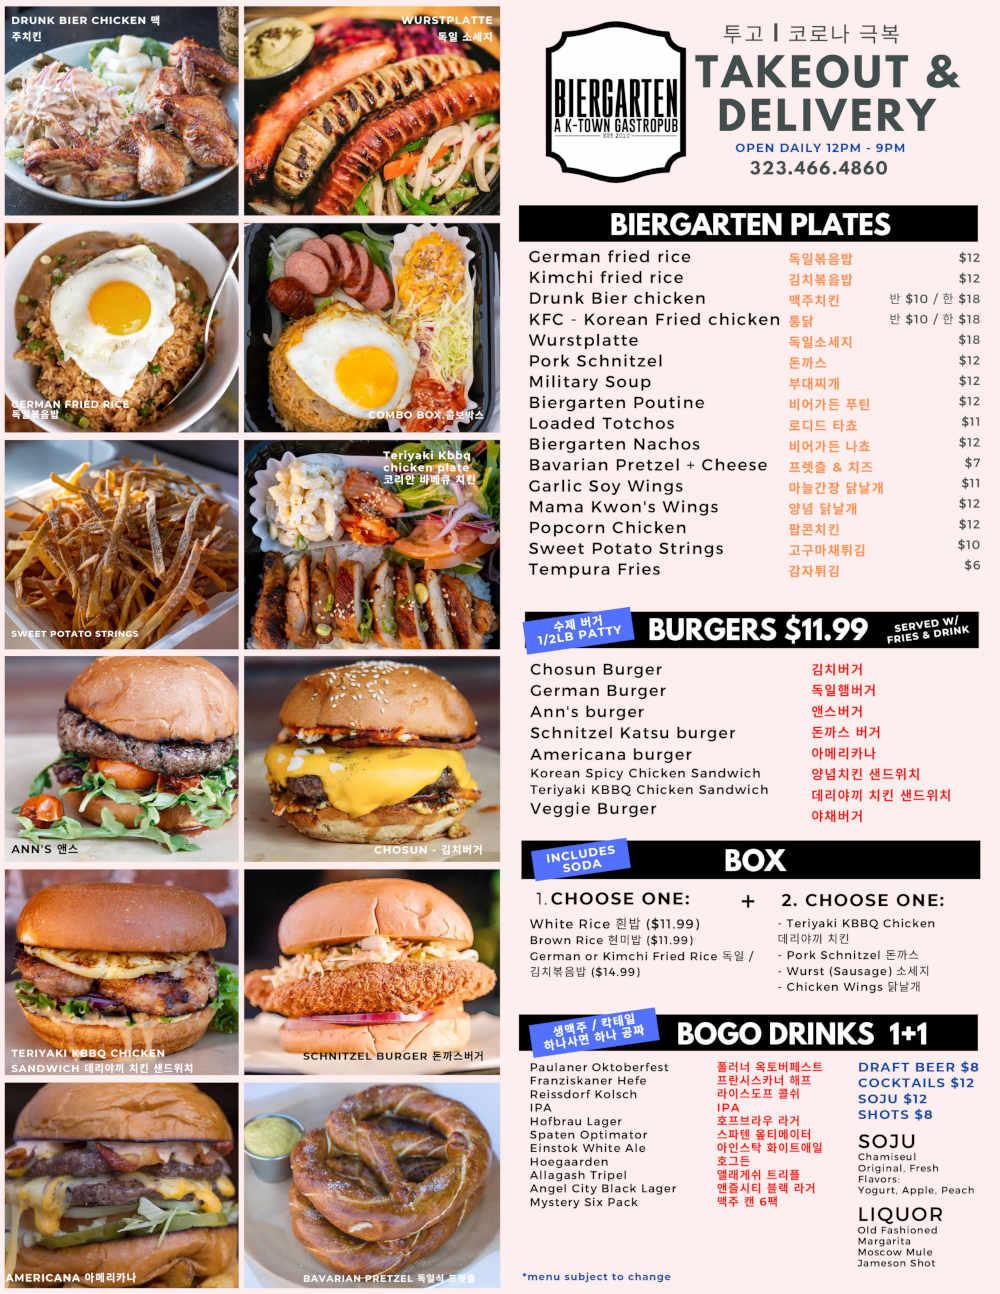 menu items listed